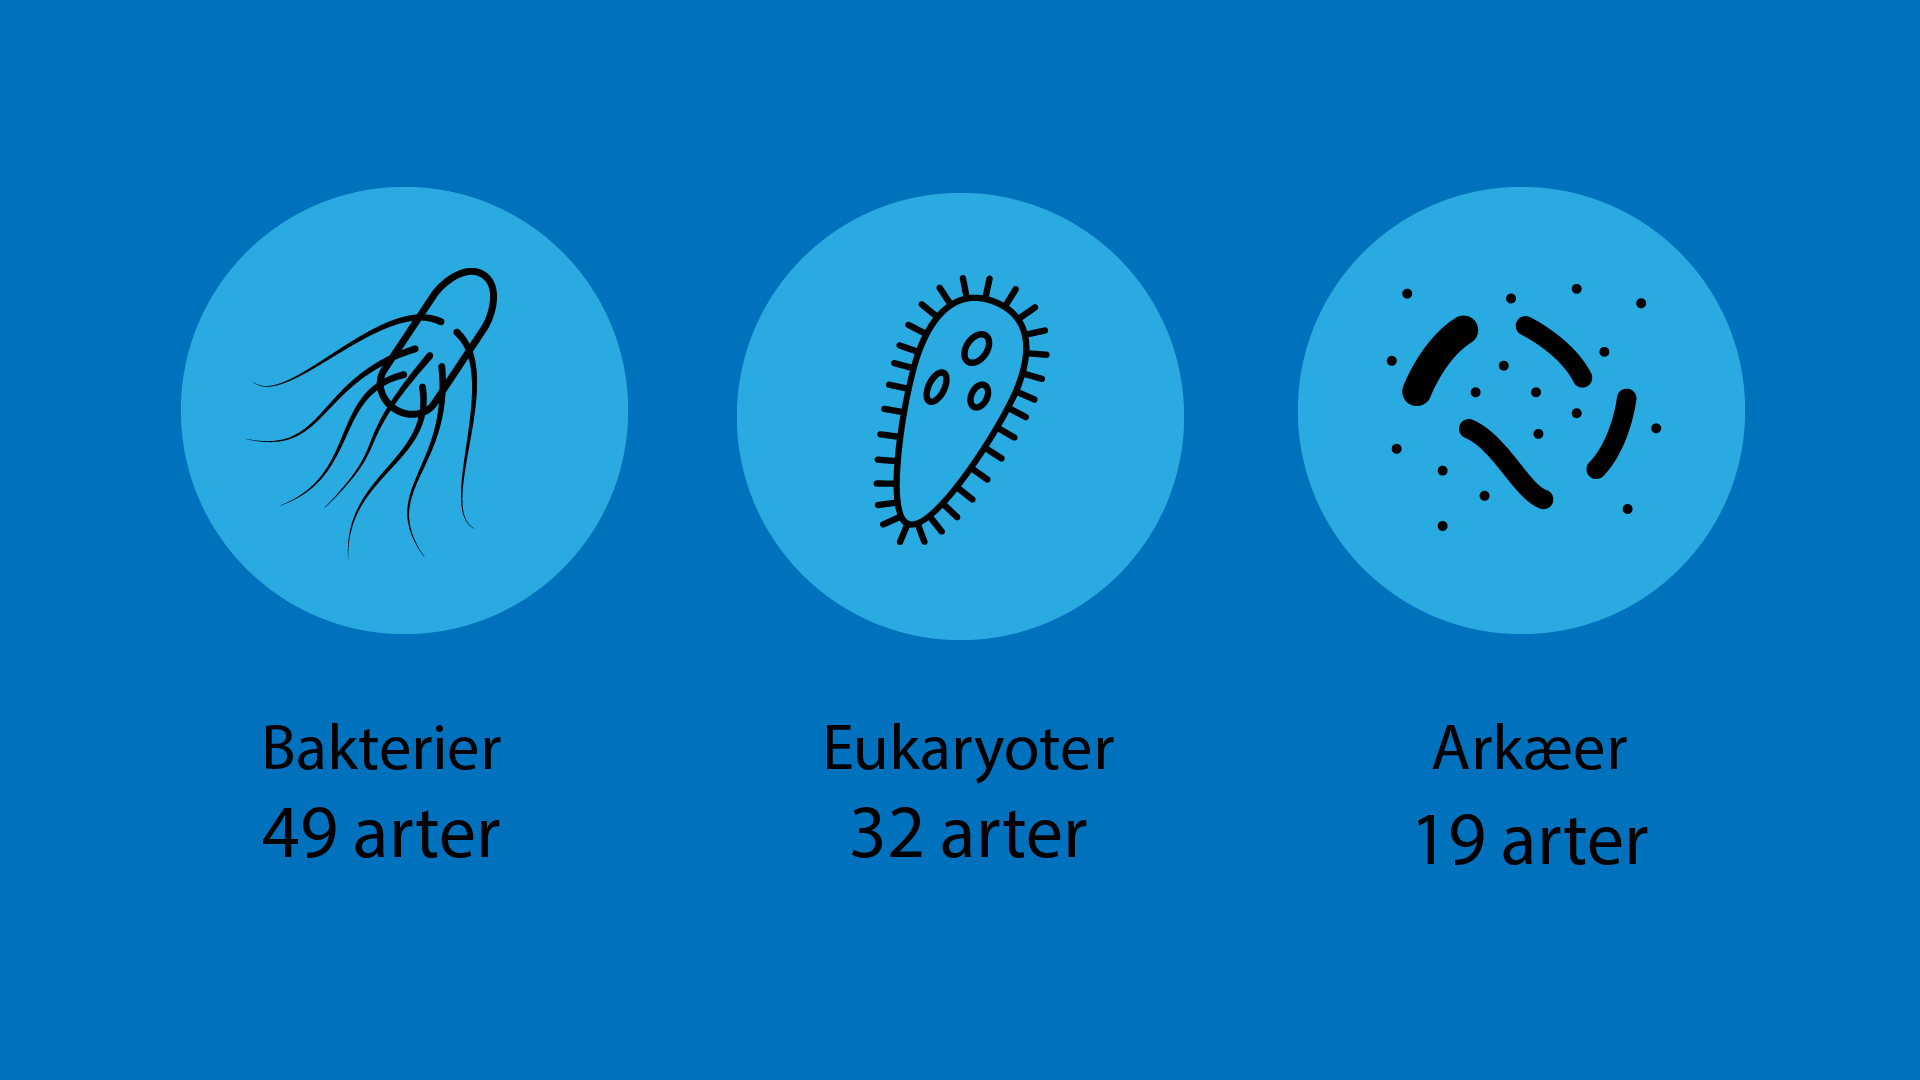 49 bakteriearter, 19 arkæarter og 32 eukaryot-arter